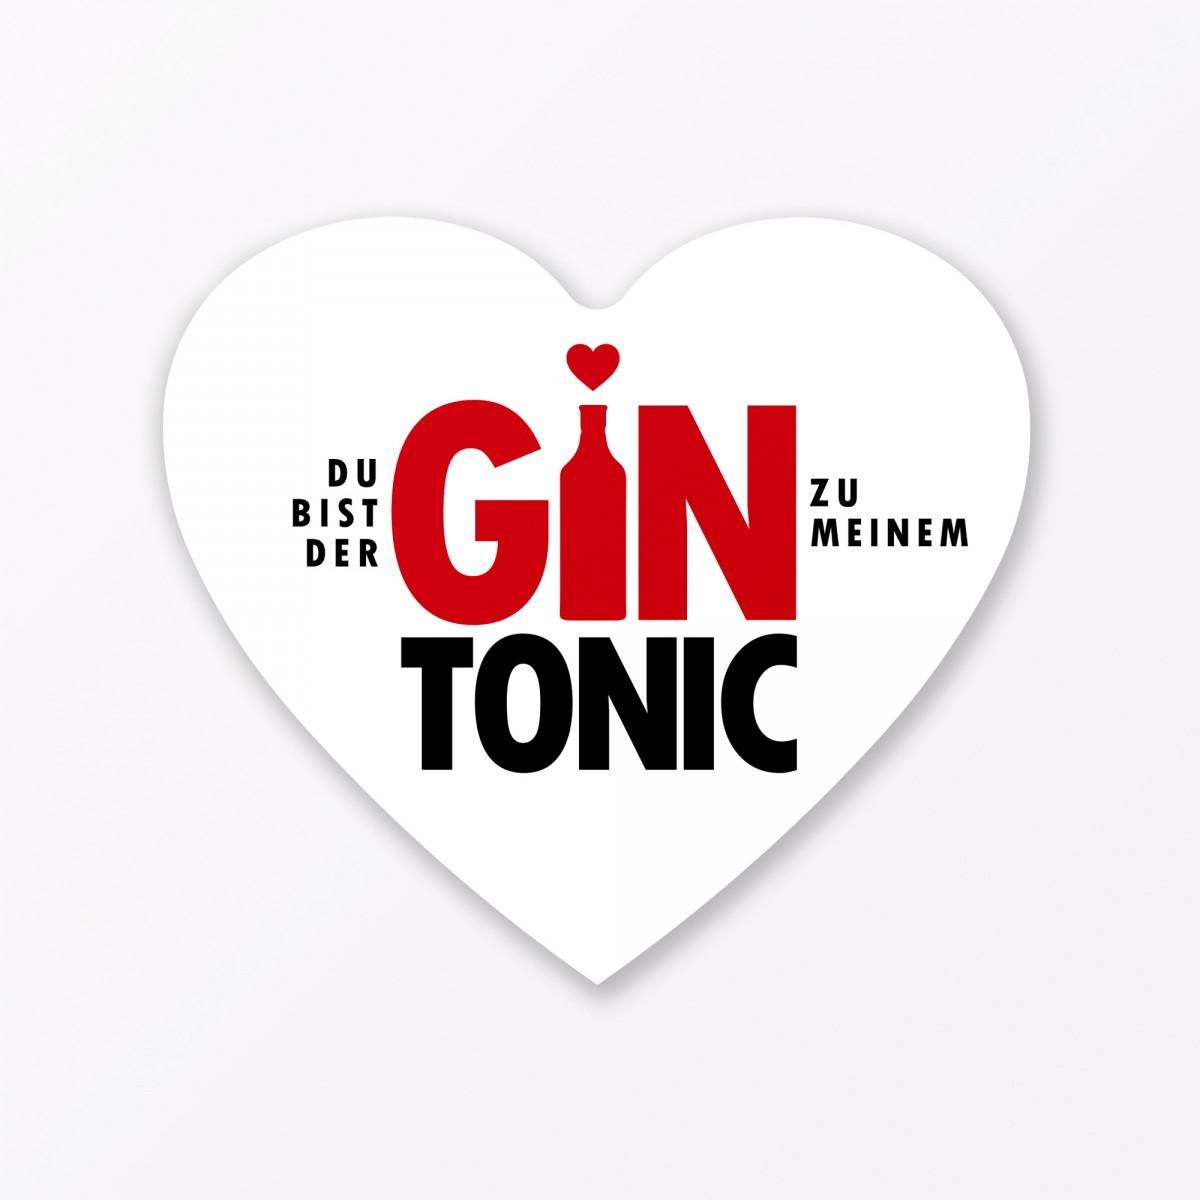 "TYPOP 3-teiliges Set Design GRUSSKARTE ""Gin Tonic"" in Herzform inkl. Umschlag + Little Breaks Gin"